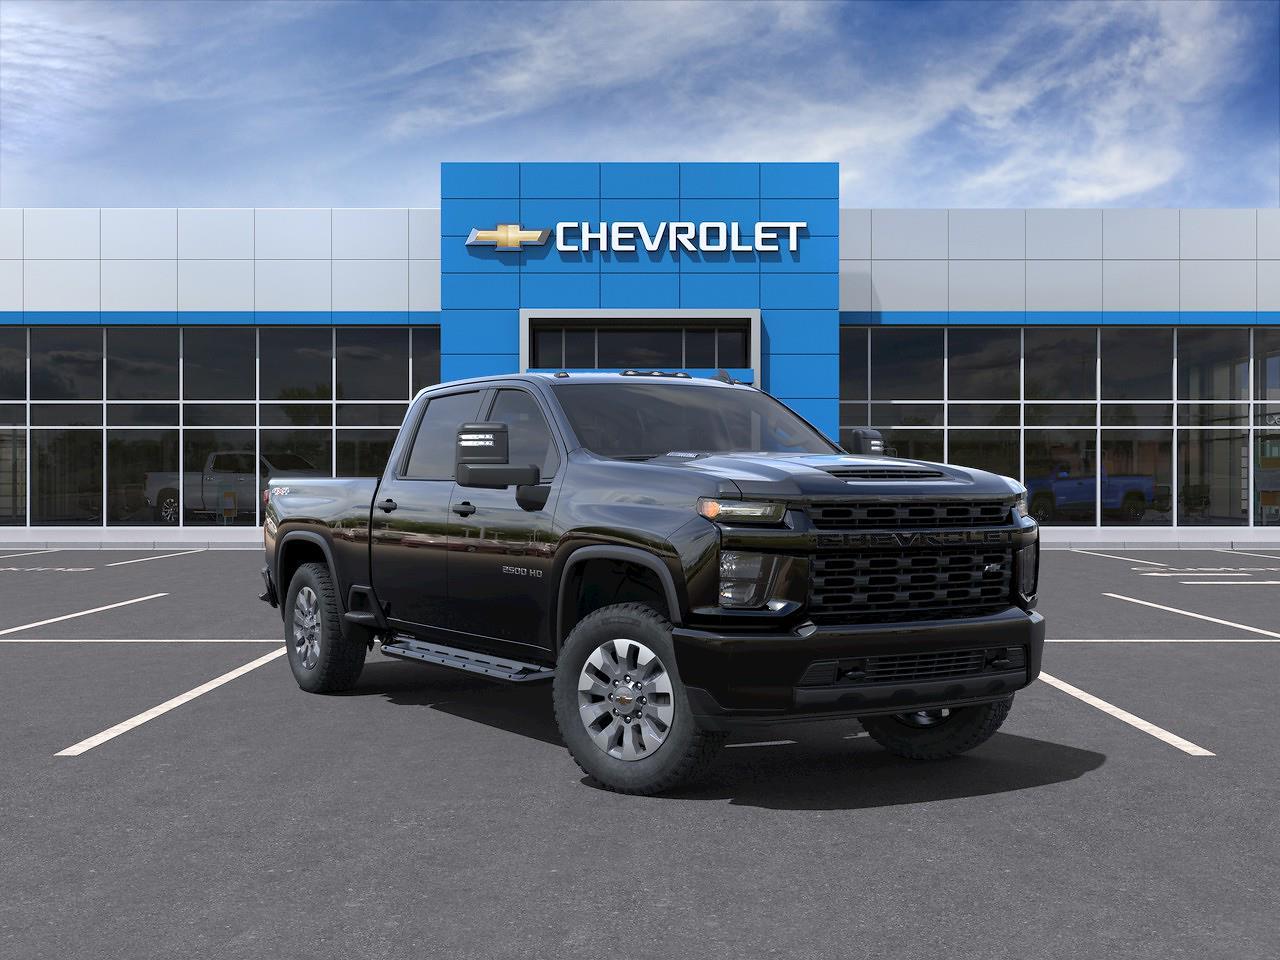 2021 Chevrolet Silverado 2500 Crew Cab 4x4, Pickup #Q210448 - photo 1